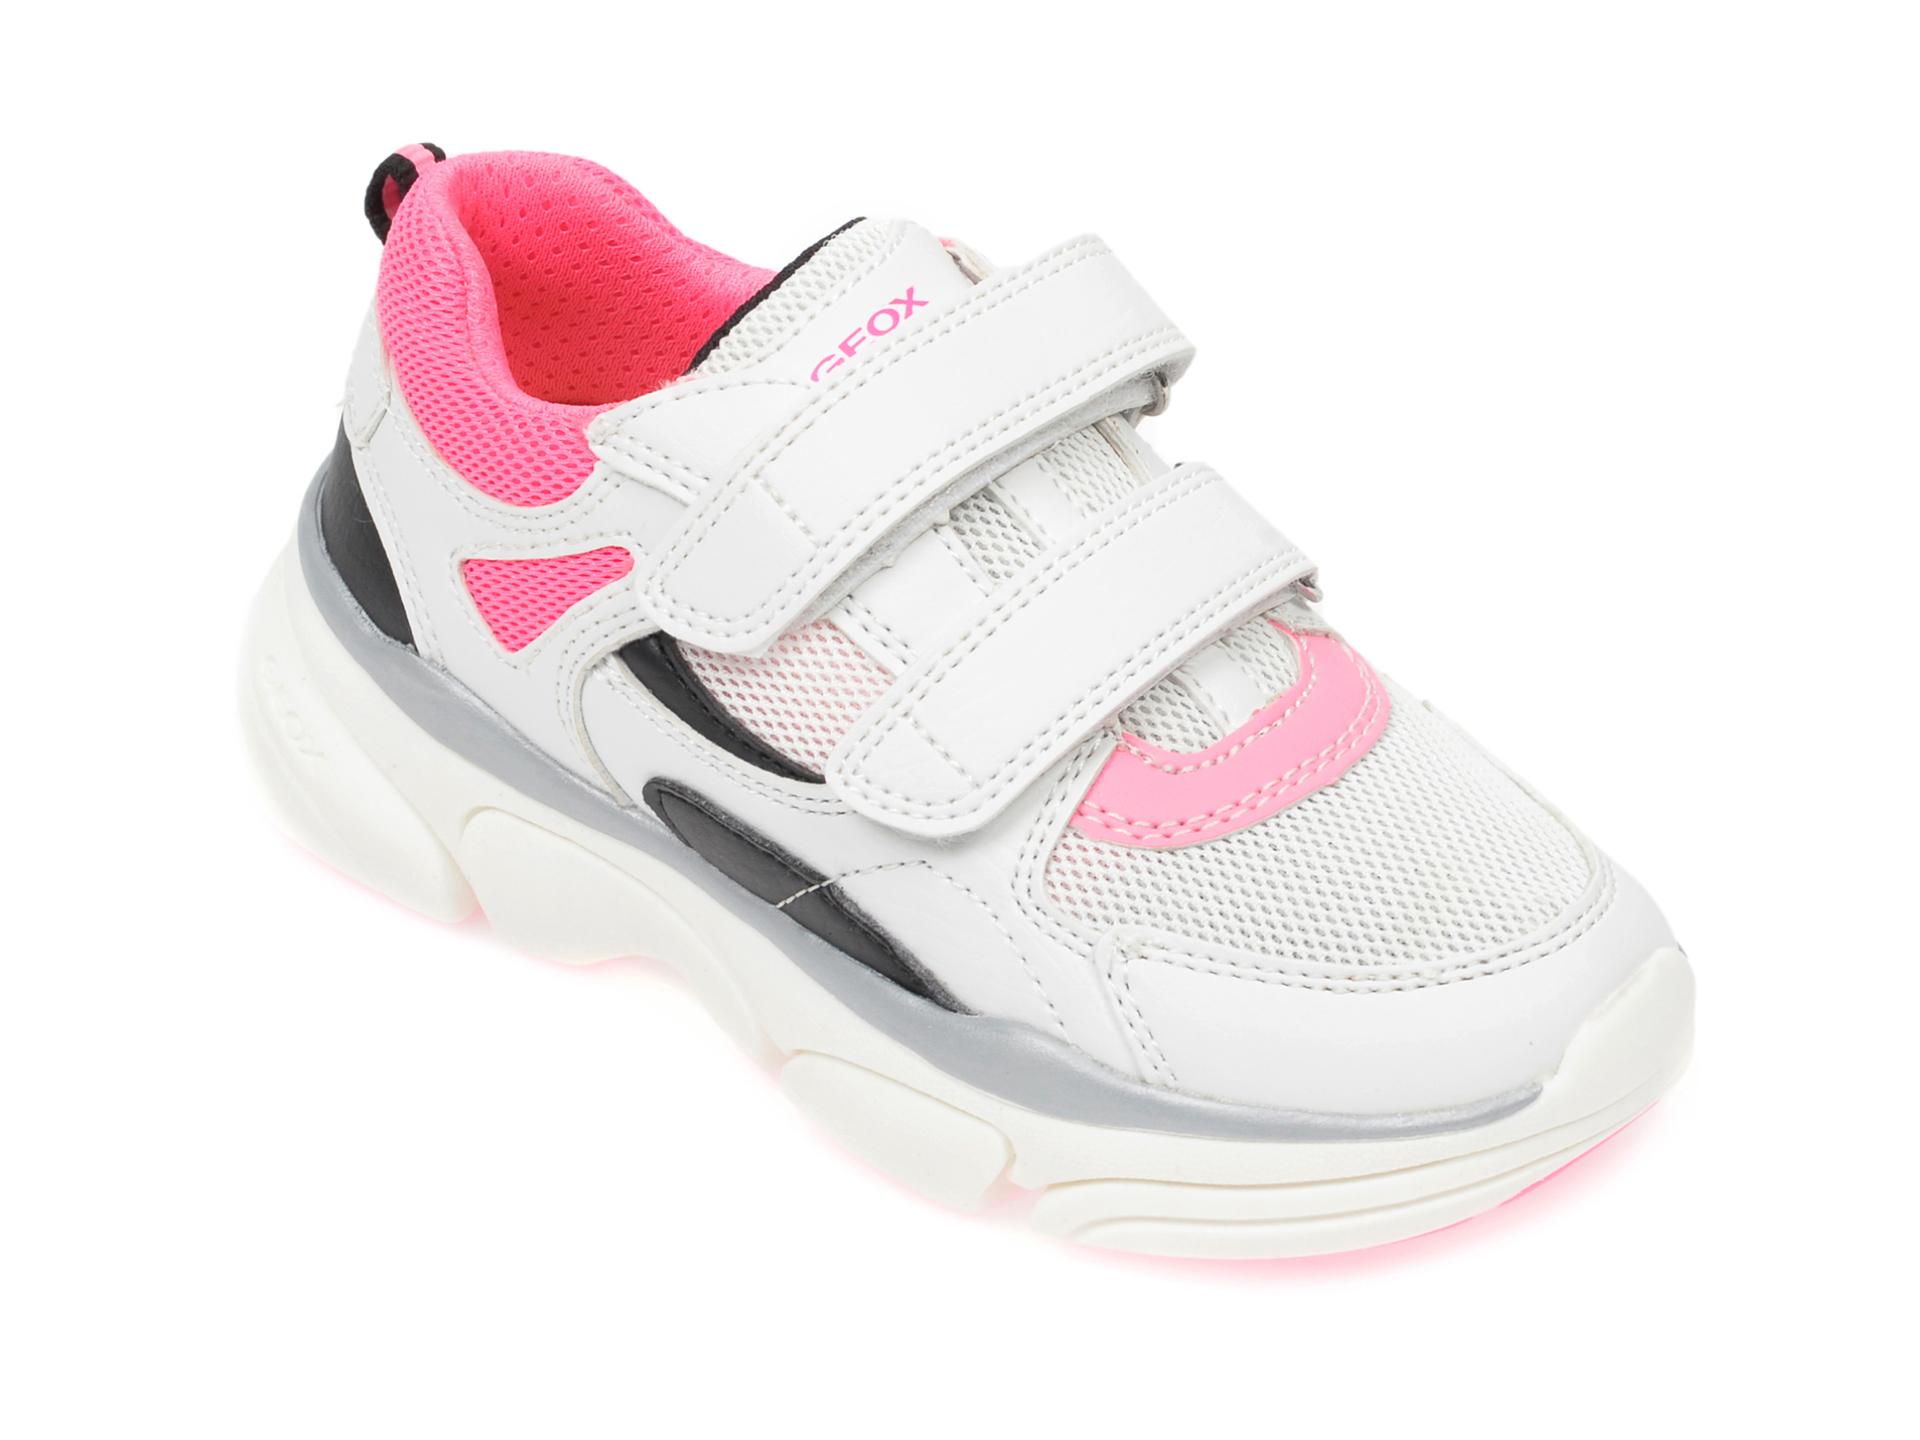 Pantofi sport GEOX albi, J02BGE, din material textil si piele ecologica New